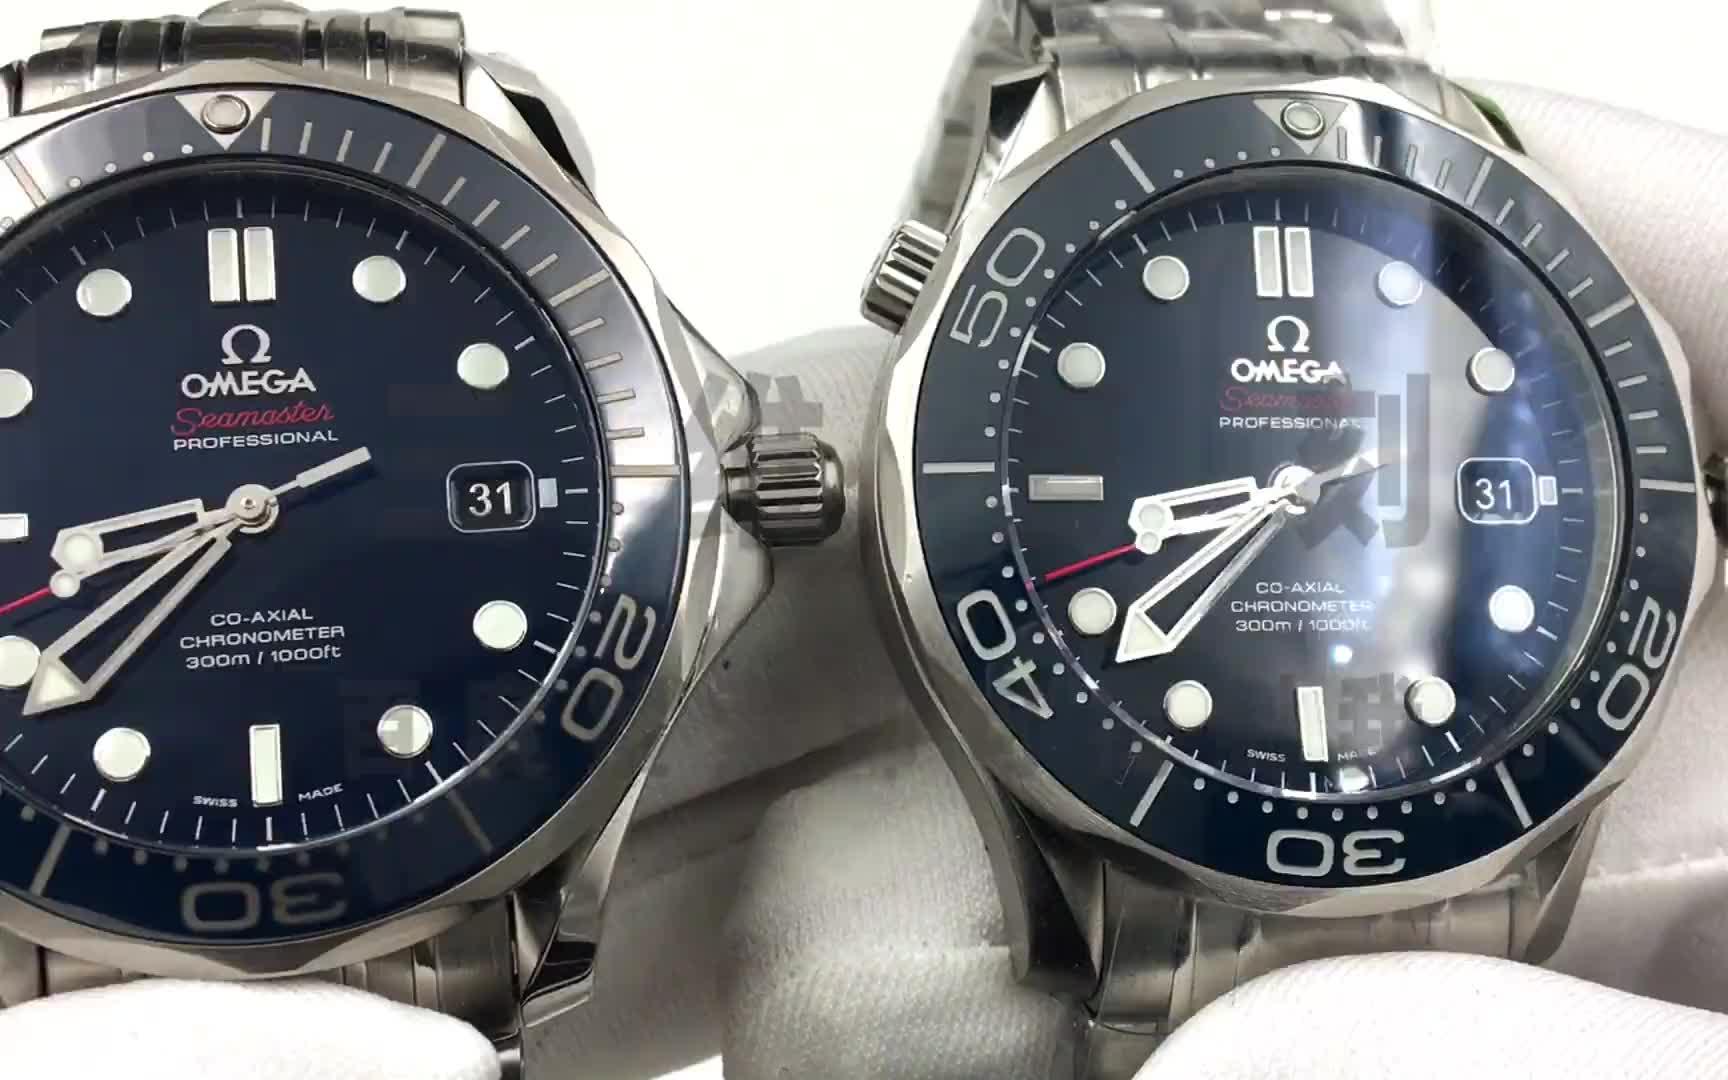 BP厂精仿顶级复刻海马海洋计时对比正品欧米茄海马系列212.30.41.20.03.001腕表-三维复刻